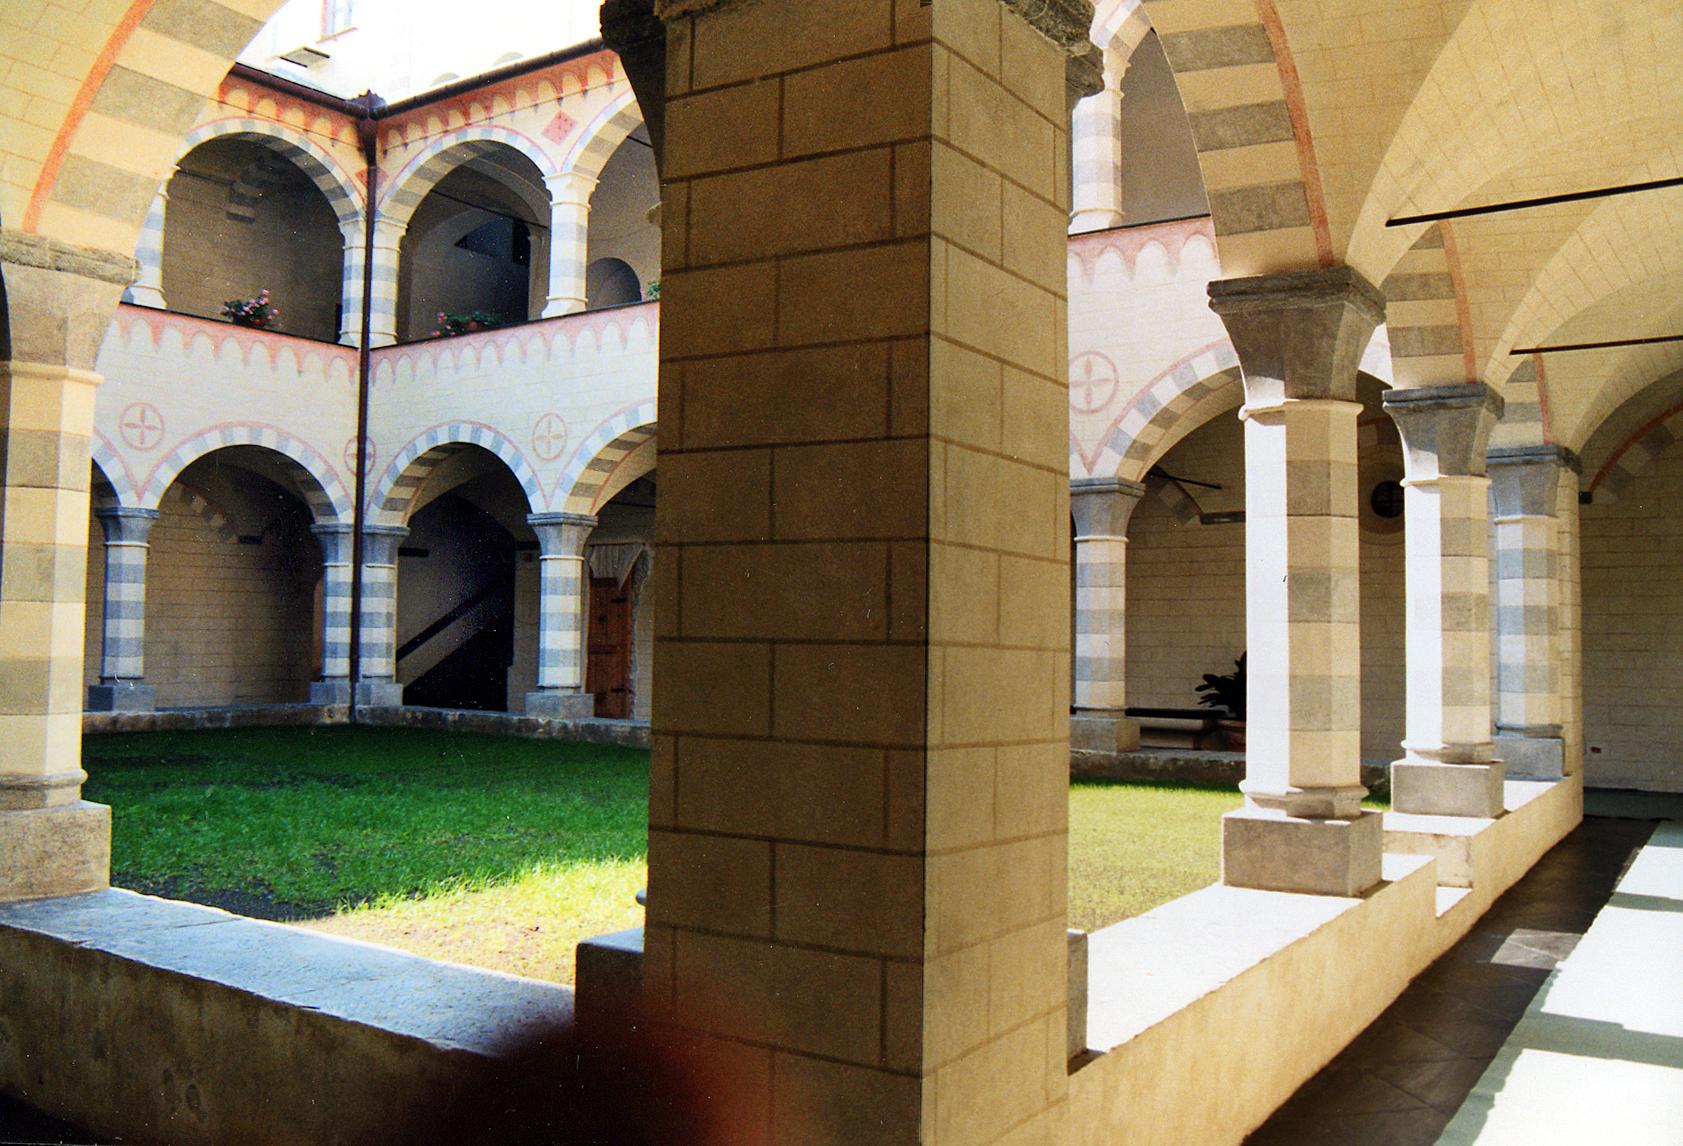 abbazia di san girolamo della cervara e parco